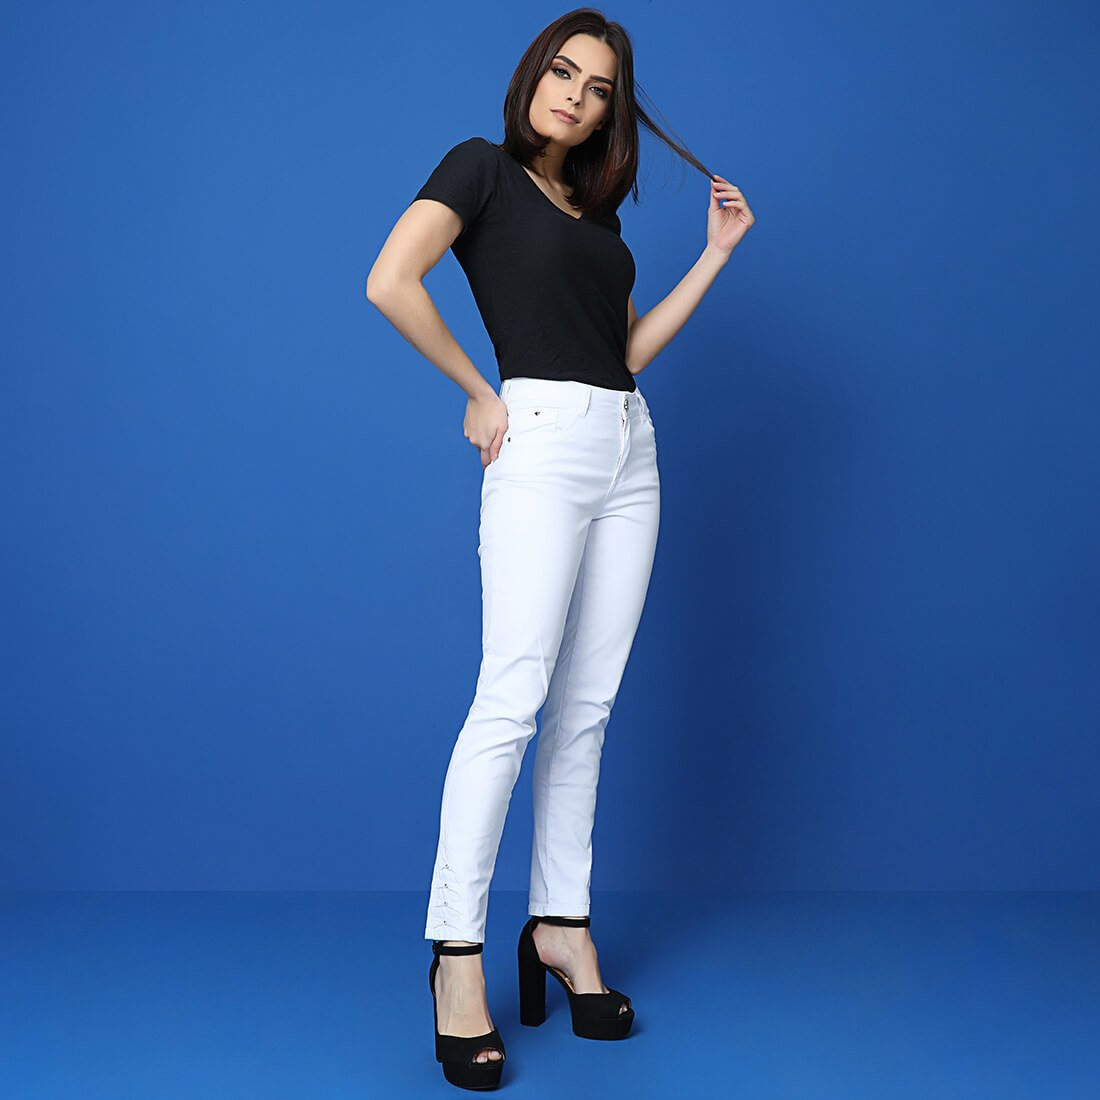 Calça Sarja Cigarrete Feminina Fact Jeans ref. 03641 - Branca